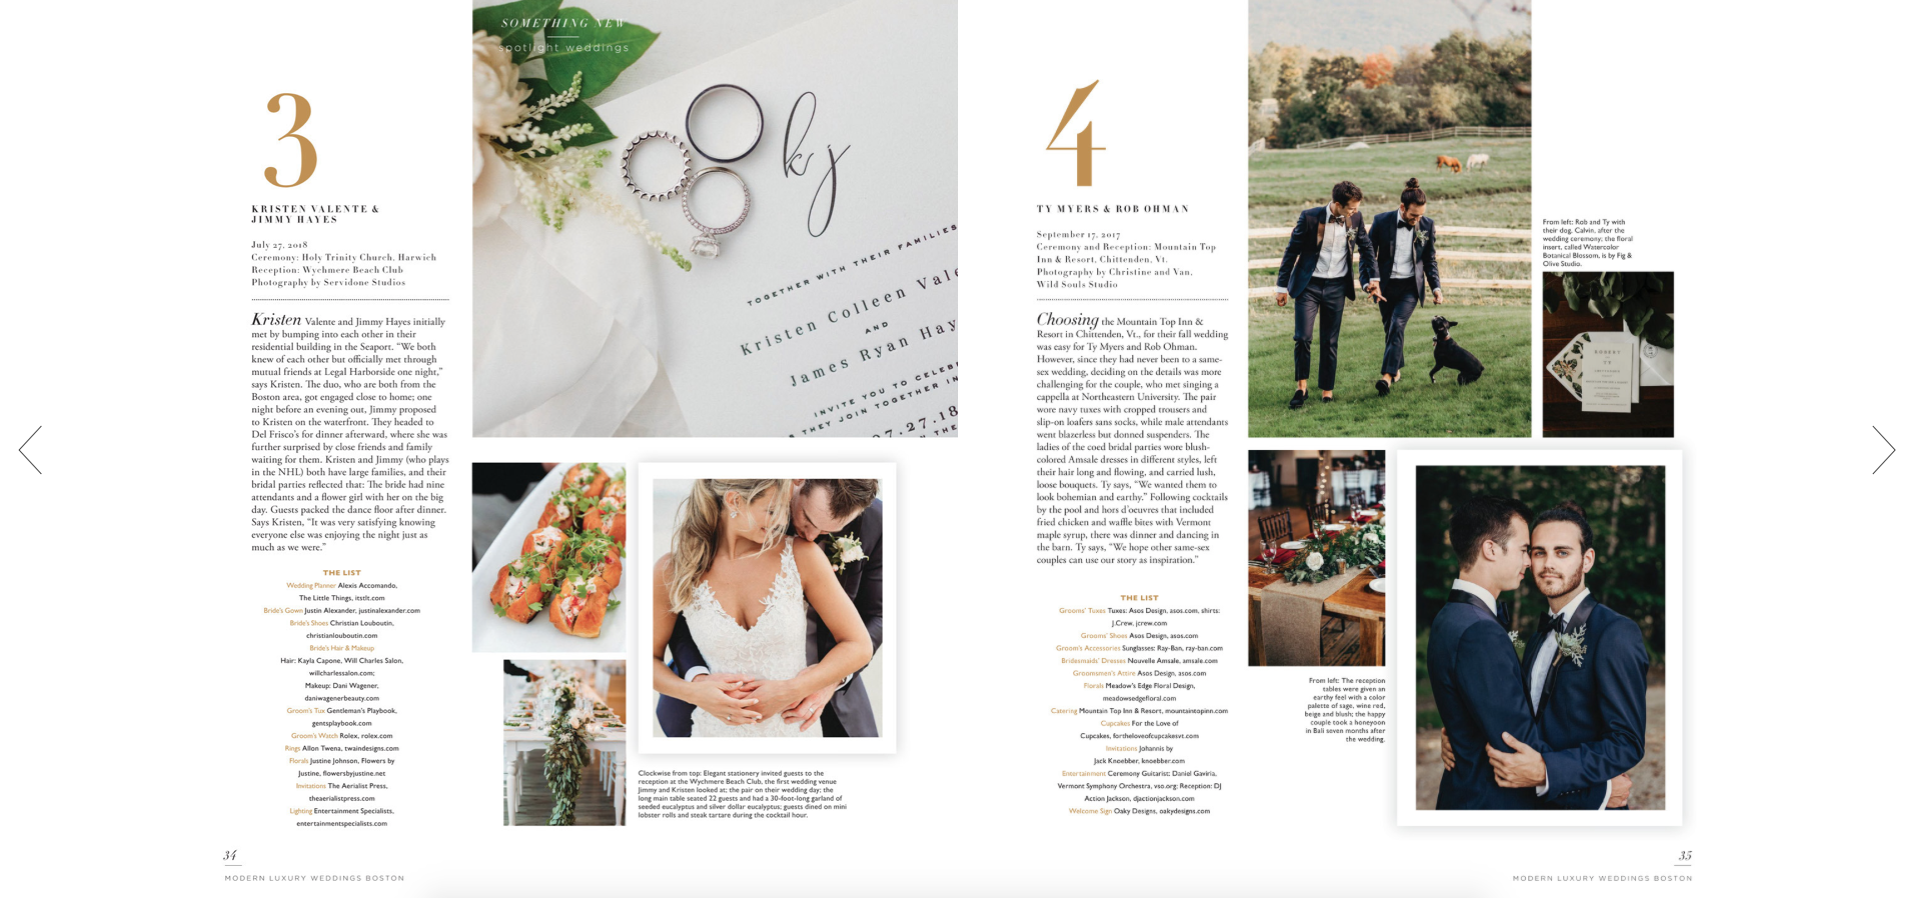 wildsoulsstudio-mountain top inn-boston wedding magazine-2.png